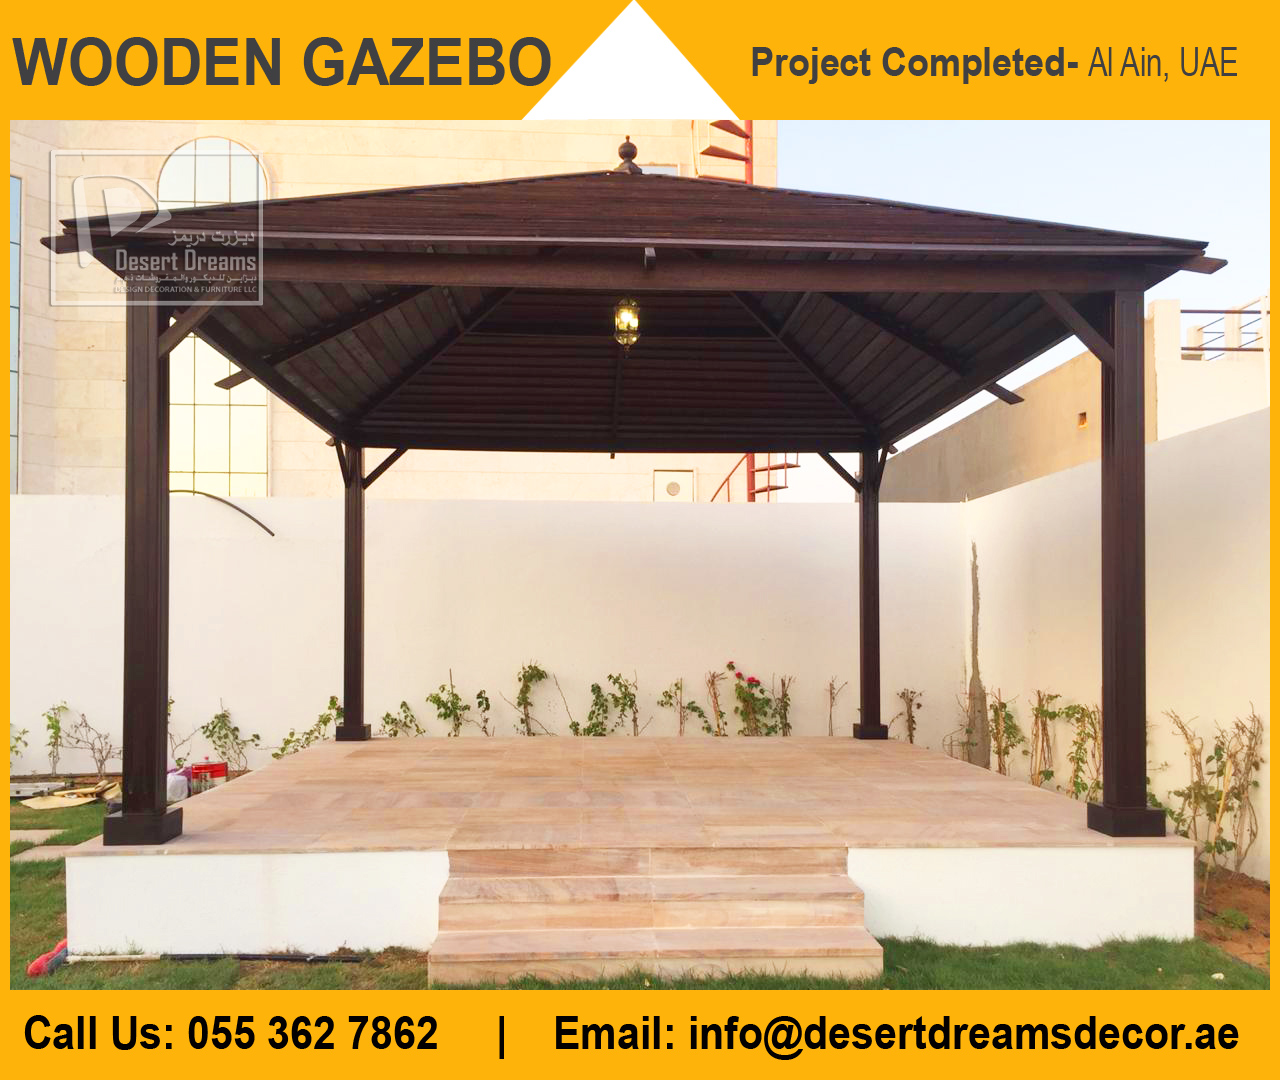 Wooden Gazebo Manufacturing and Installing in UAE_Wooden Gazebo Images_Desert Dreams (2).jpg